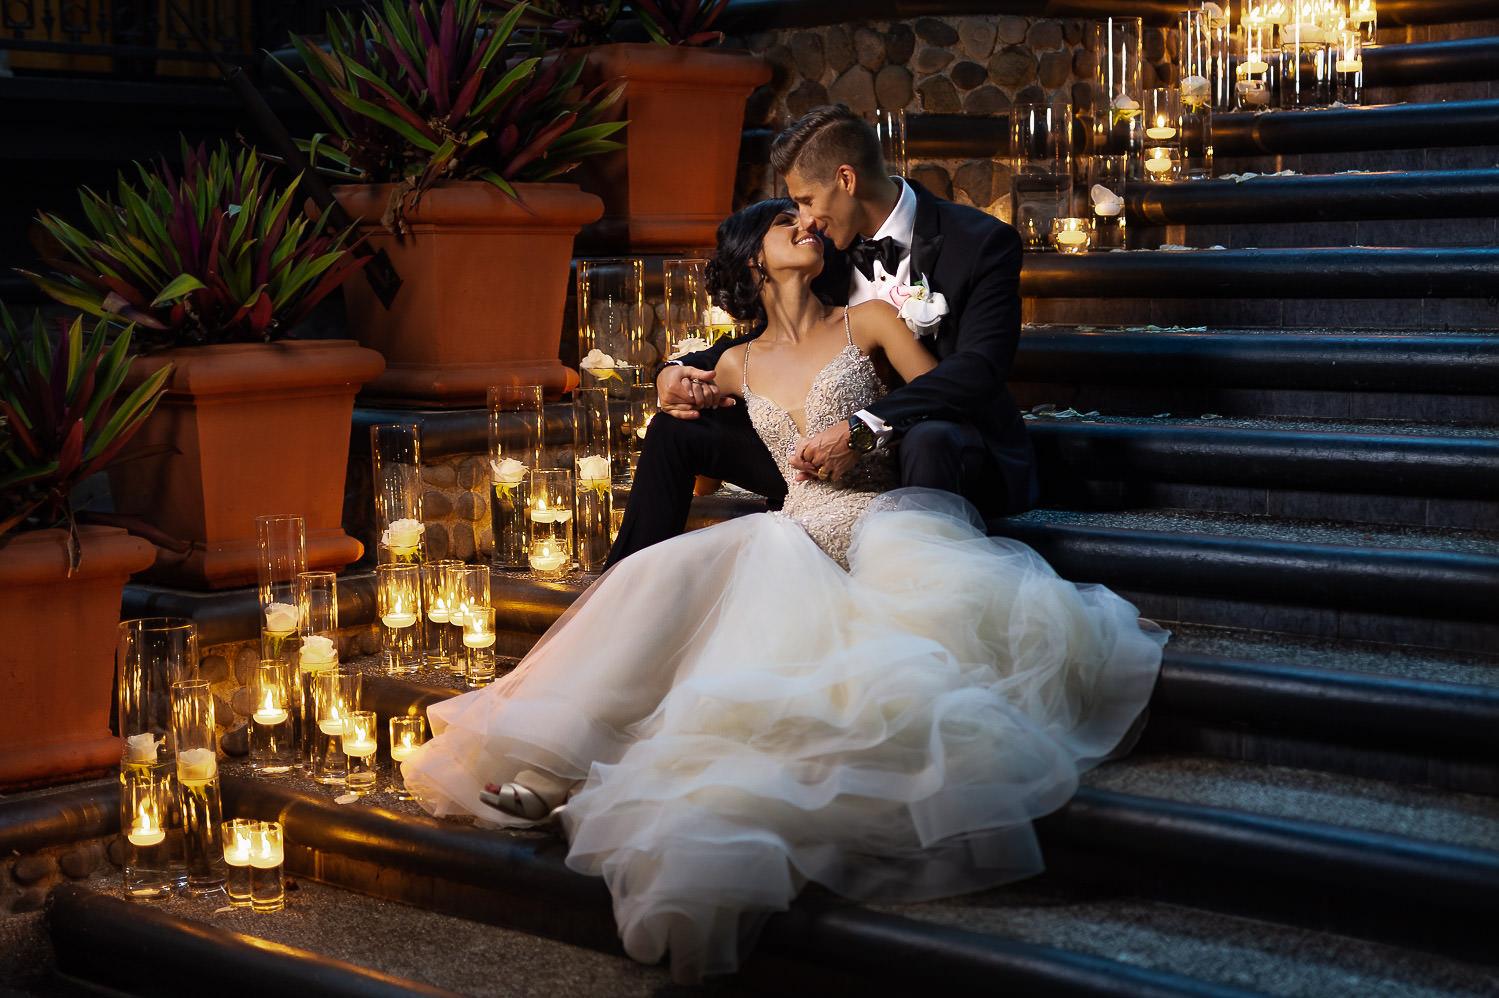 Zephyr Palace Costa Rica Wedding Photography